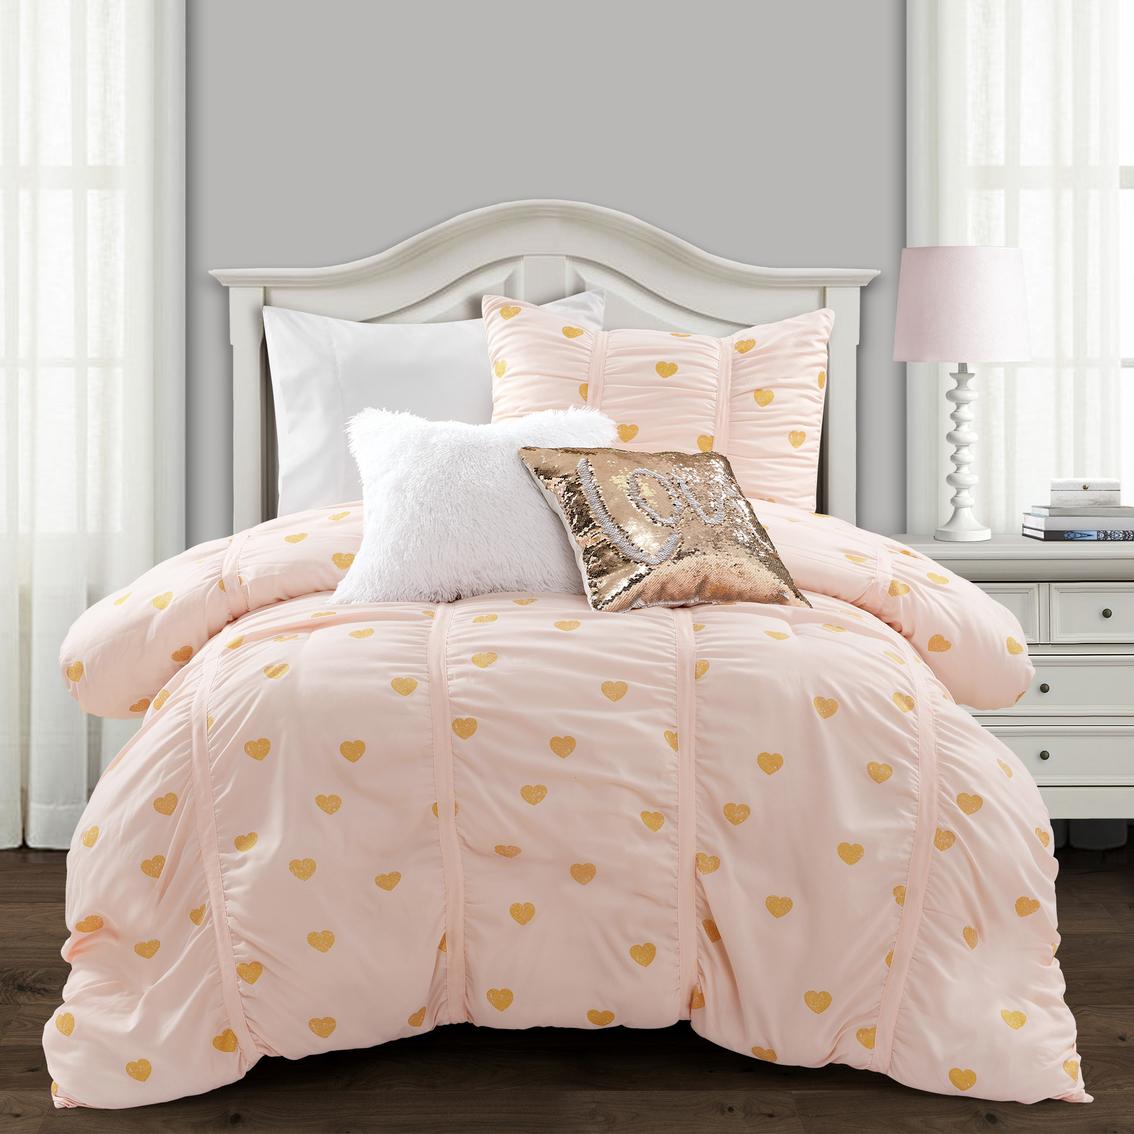 Lush Decor 3 Pc Distressed Metallic Heart Print Comforter Set Bedspreads Household Shop The Exchange